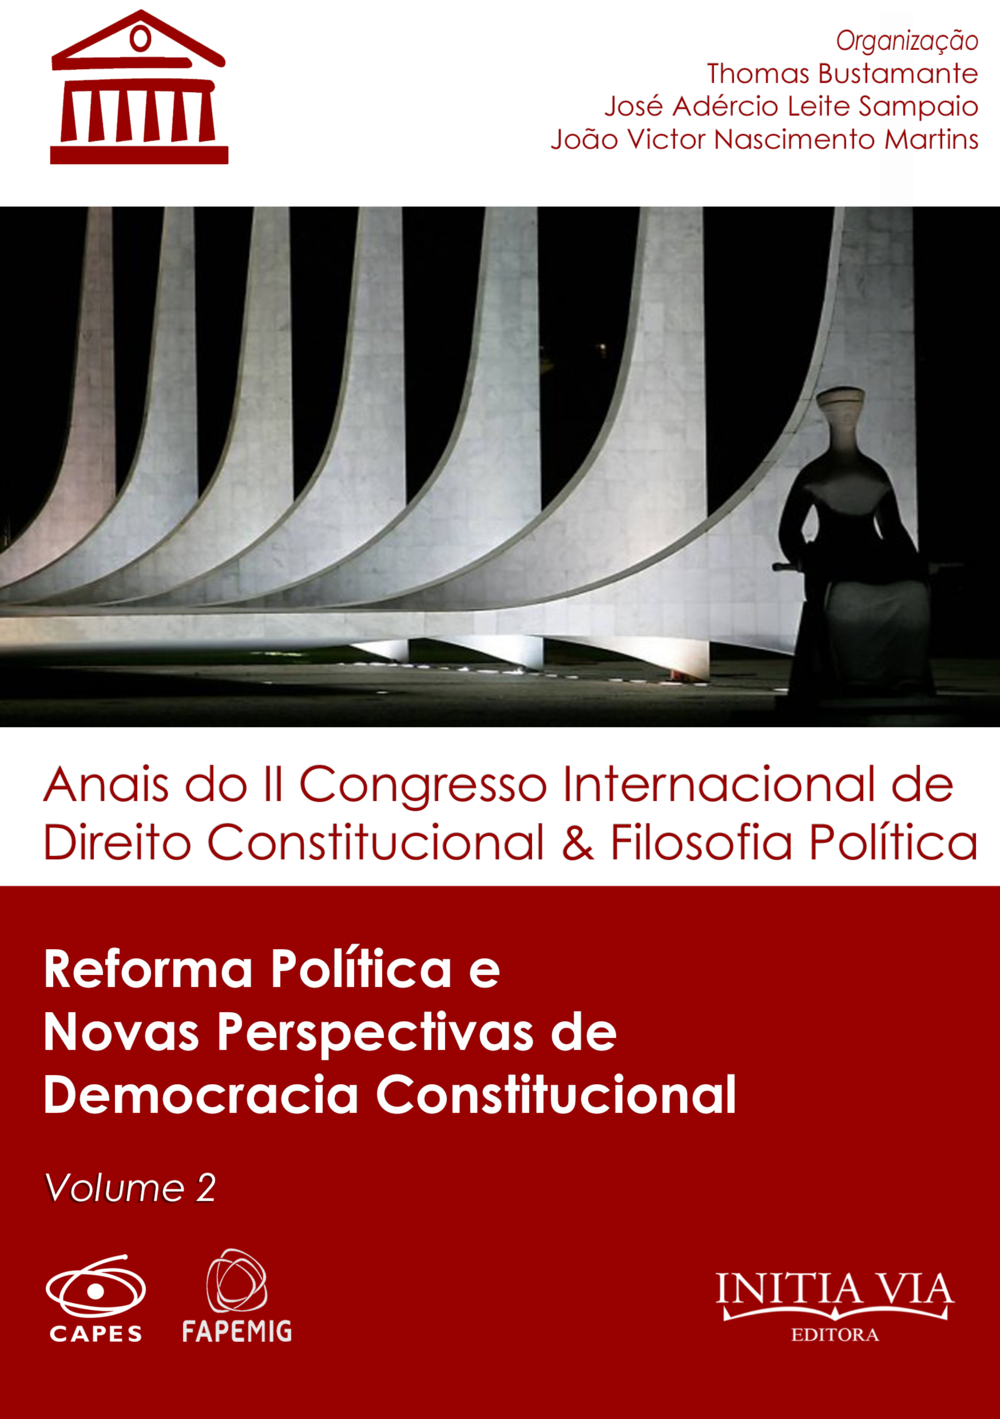 Bustamante_Congresso_DCFP15_V02.png